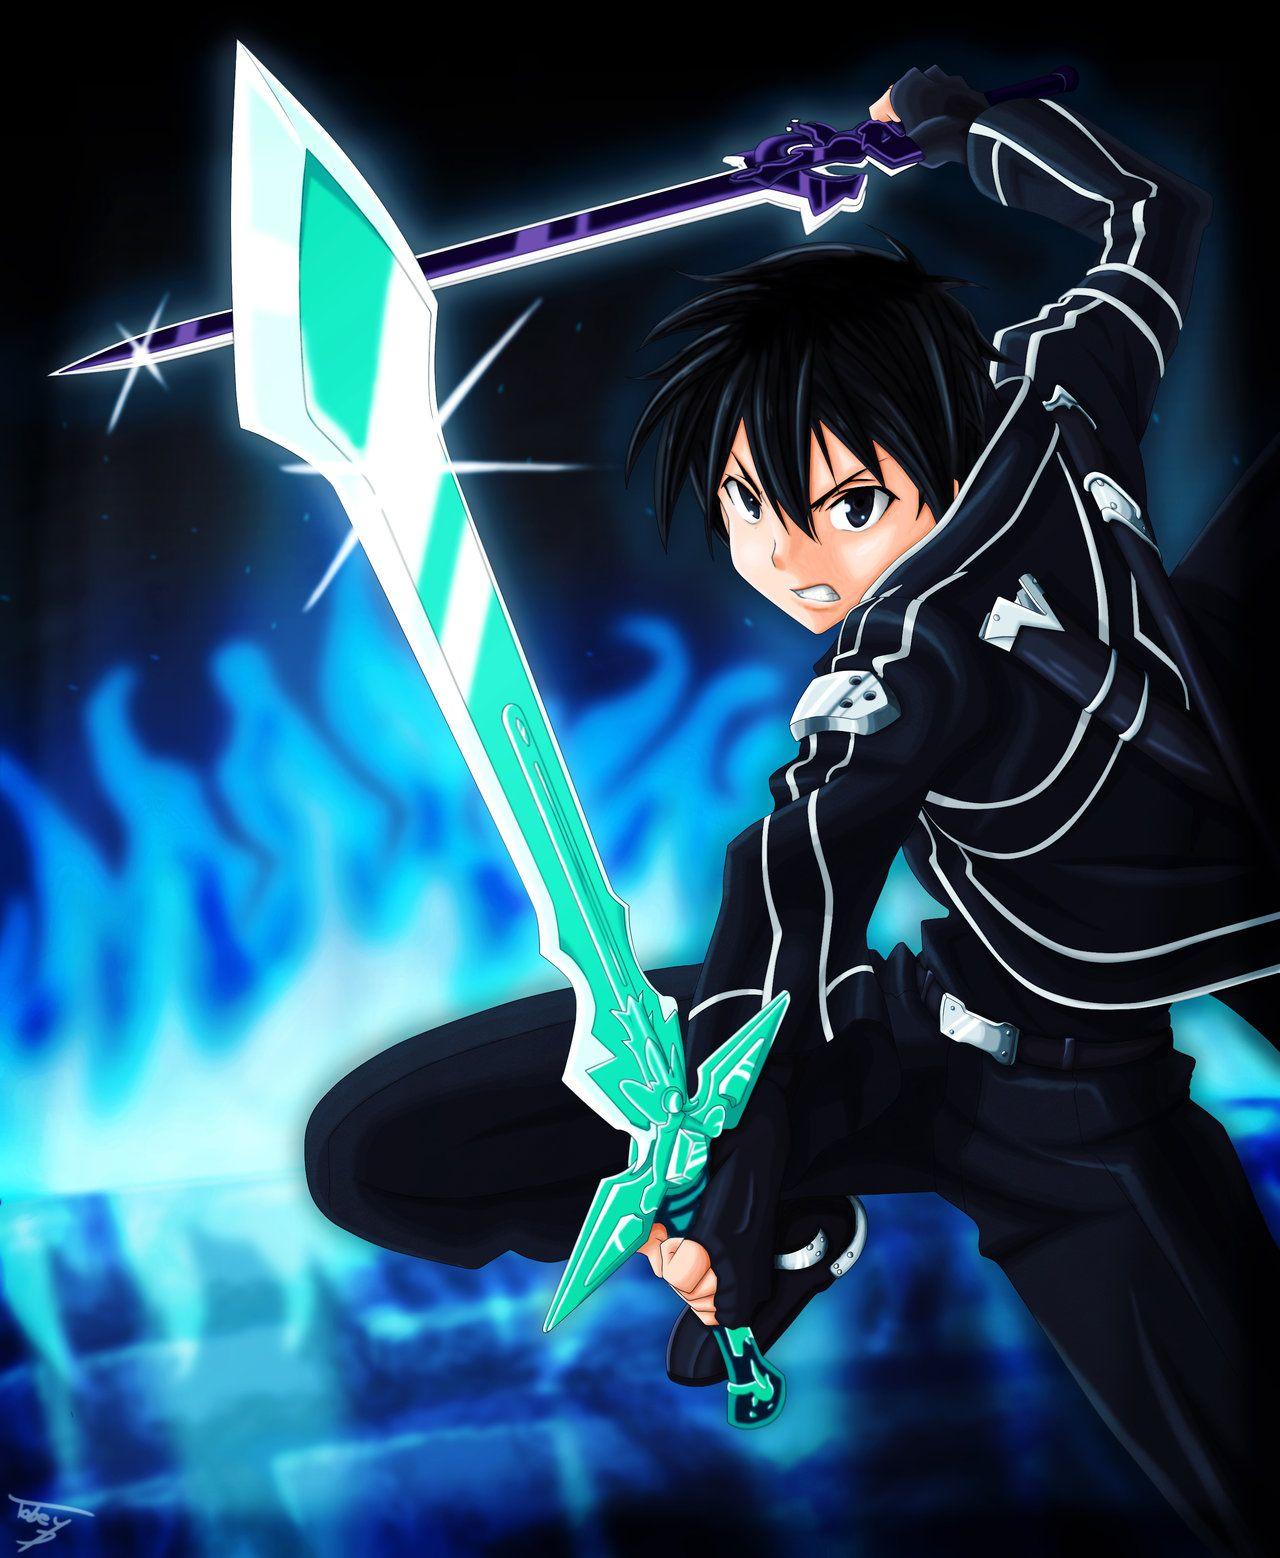 Kirito Dual Blade By Tobeyd On Deviantart Kirito Sword Art Online Kirito Kirito Sword